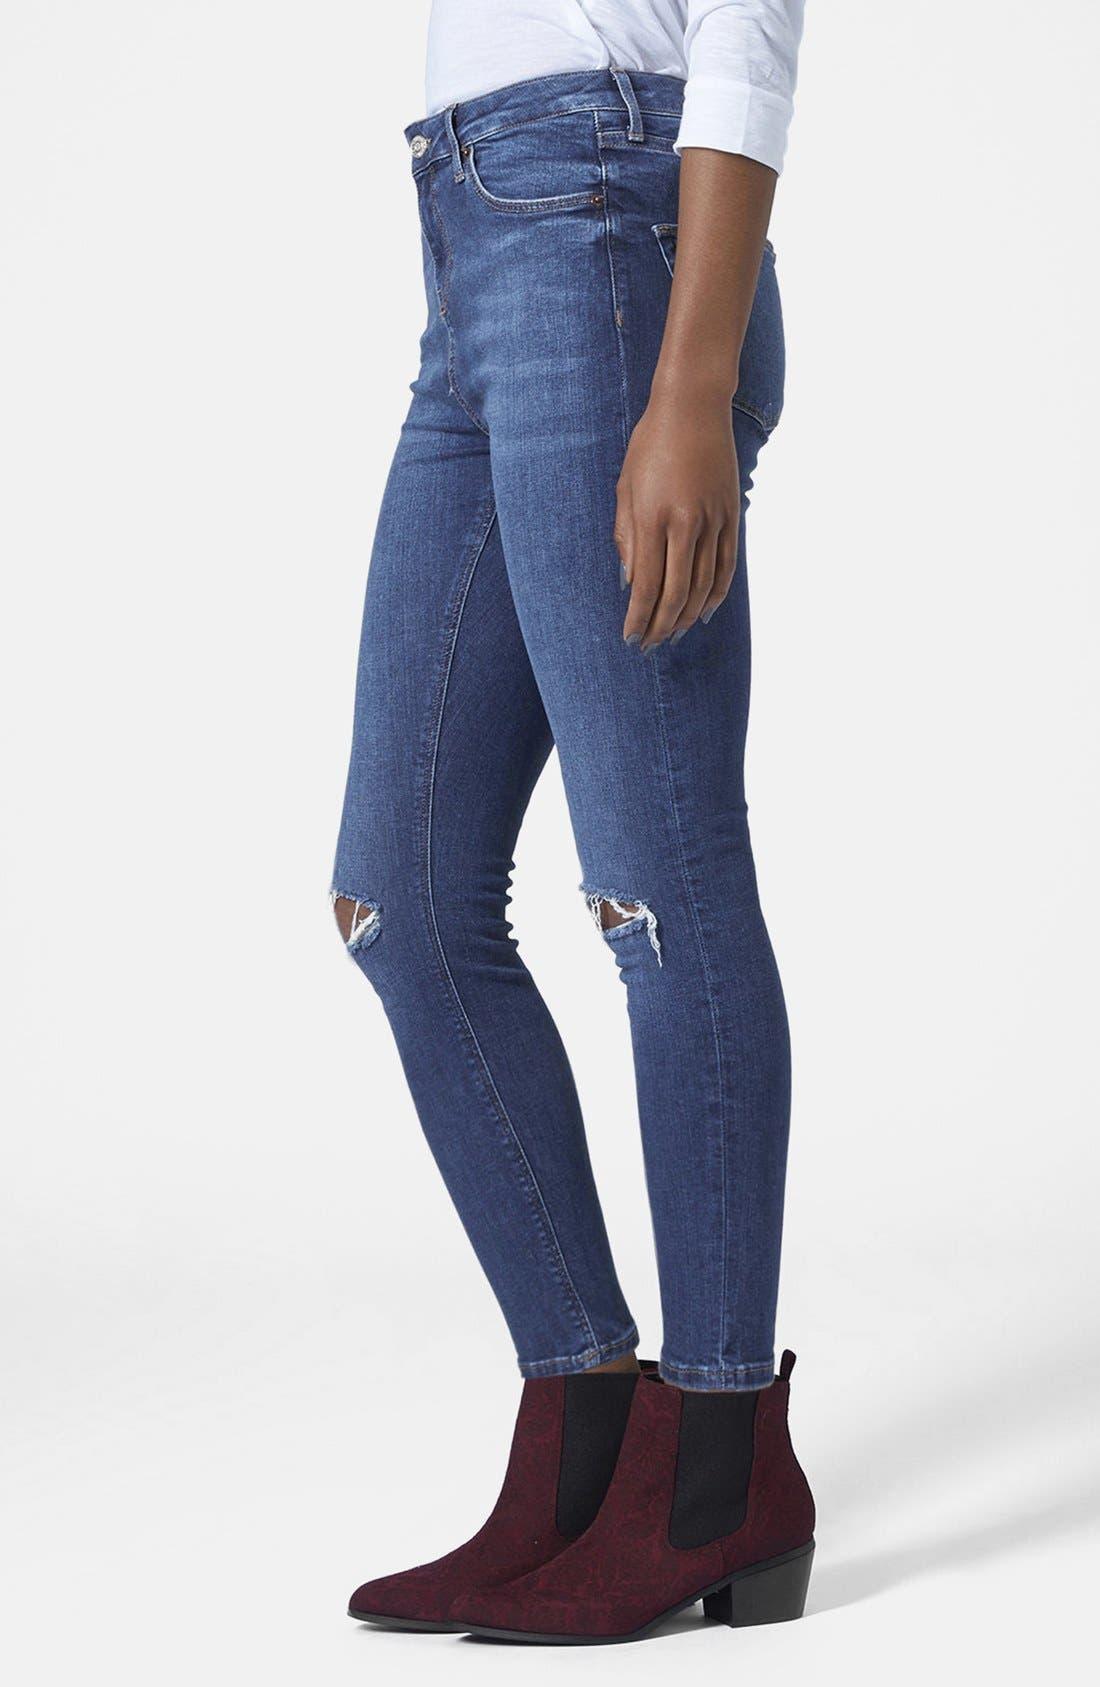 Alternate Image 1 Selected - Topshop Moto 'Jamie' High Rise Skinny Jeans (Petite)